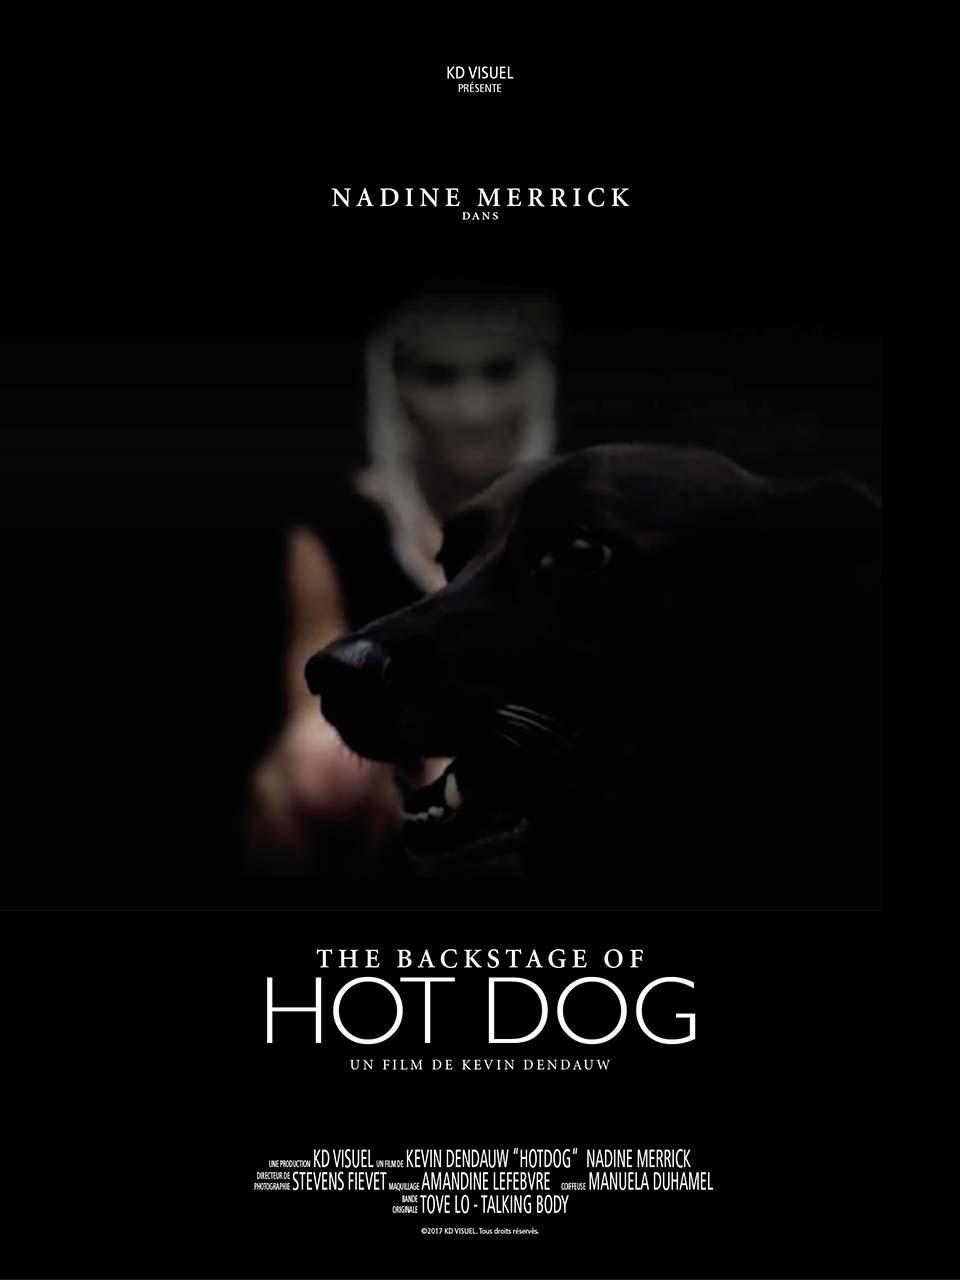 Affiche HotDog vidéaste Lille KD Visuel